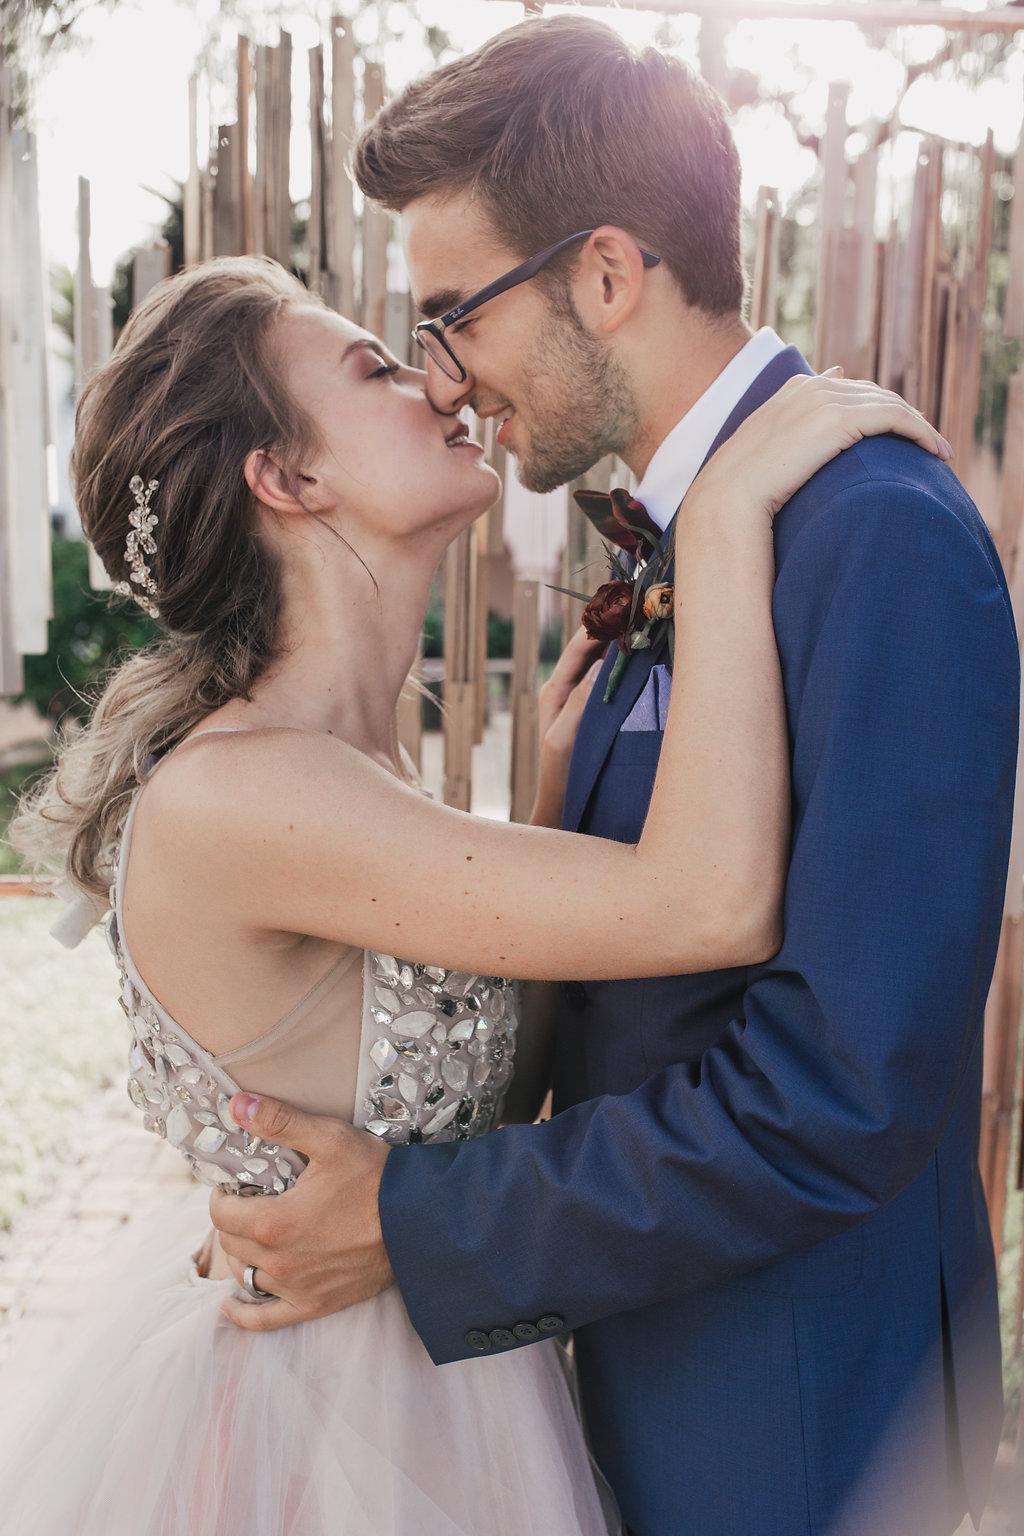 romantic wedding photography - photo by Alondra Vega Photography https://ruffledblog.com/jewel-toned-wedding-ideas-with-a-surprise-proposal